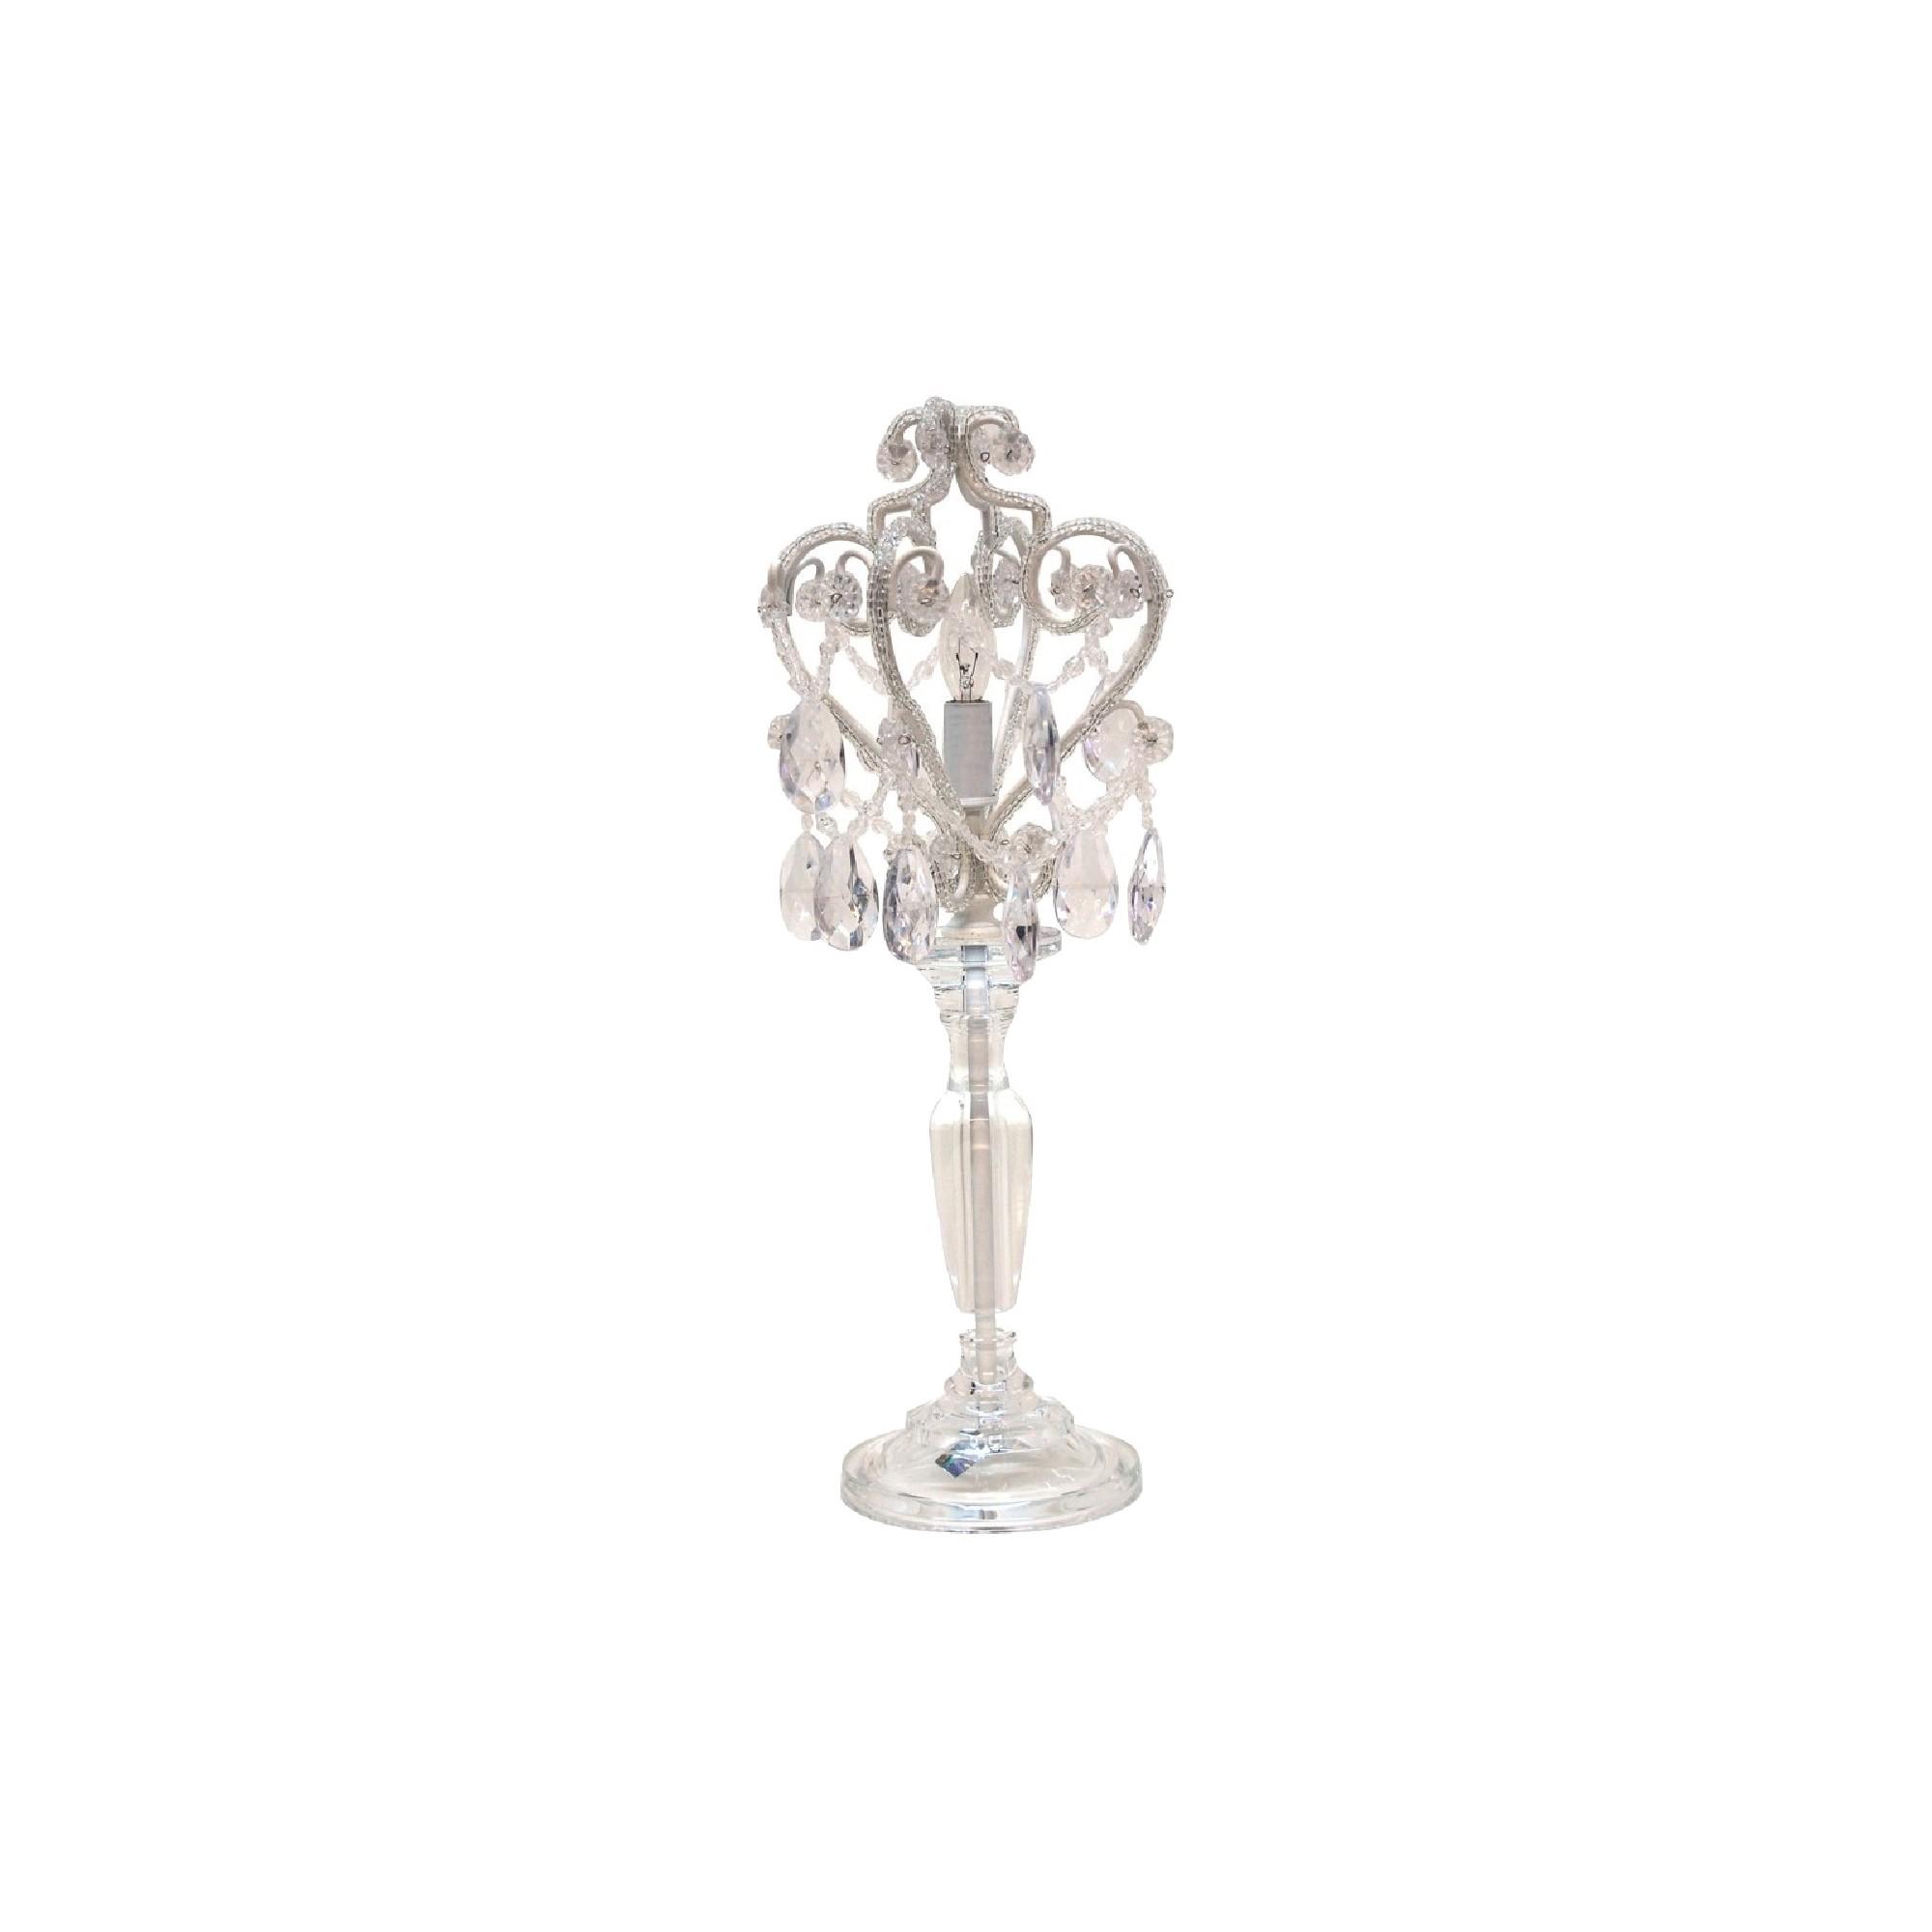 Tadpoles Chandelier Table Lamp - Diamond (Lamp Only), Women's